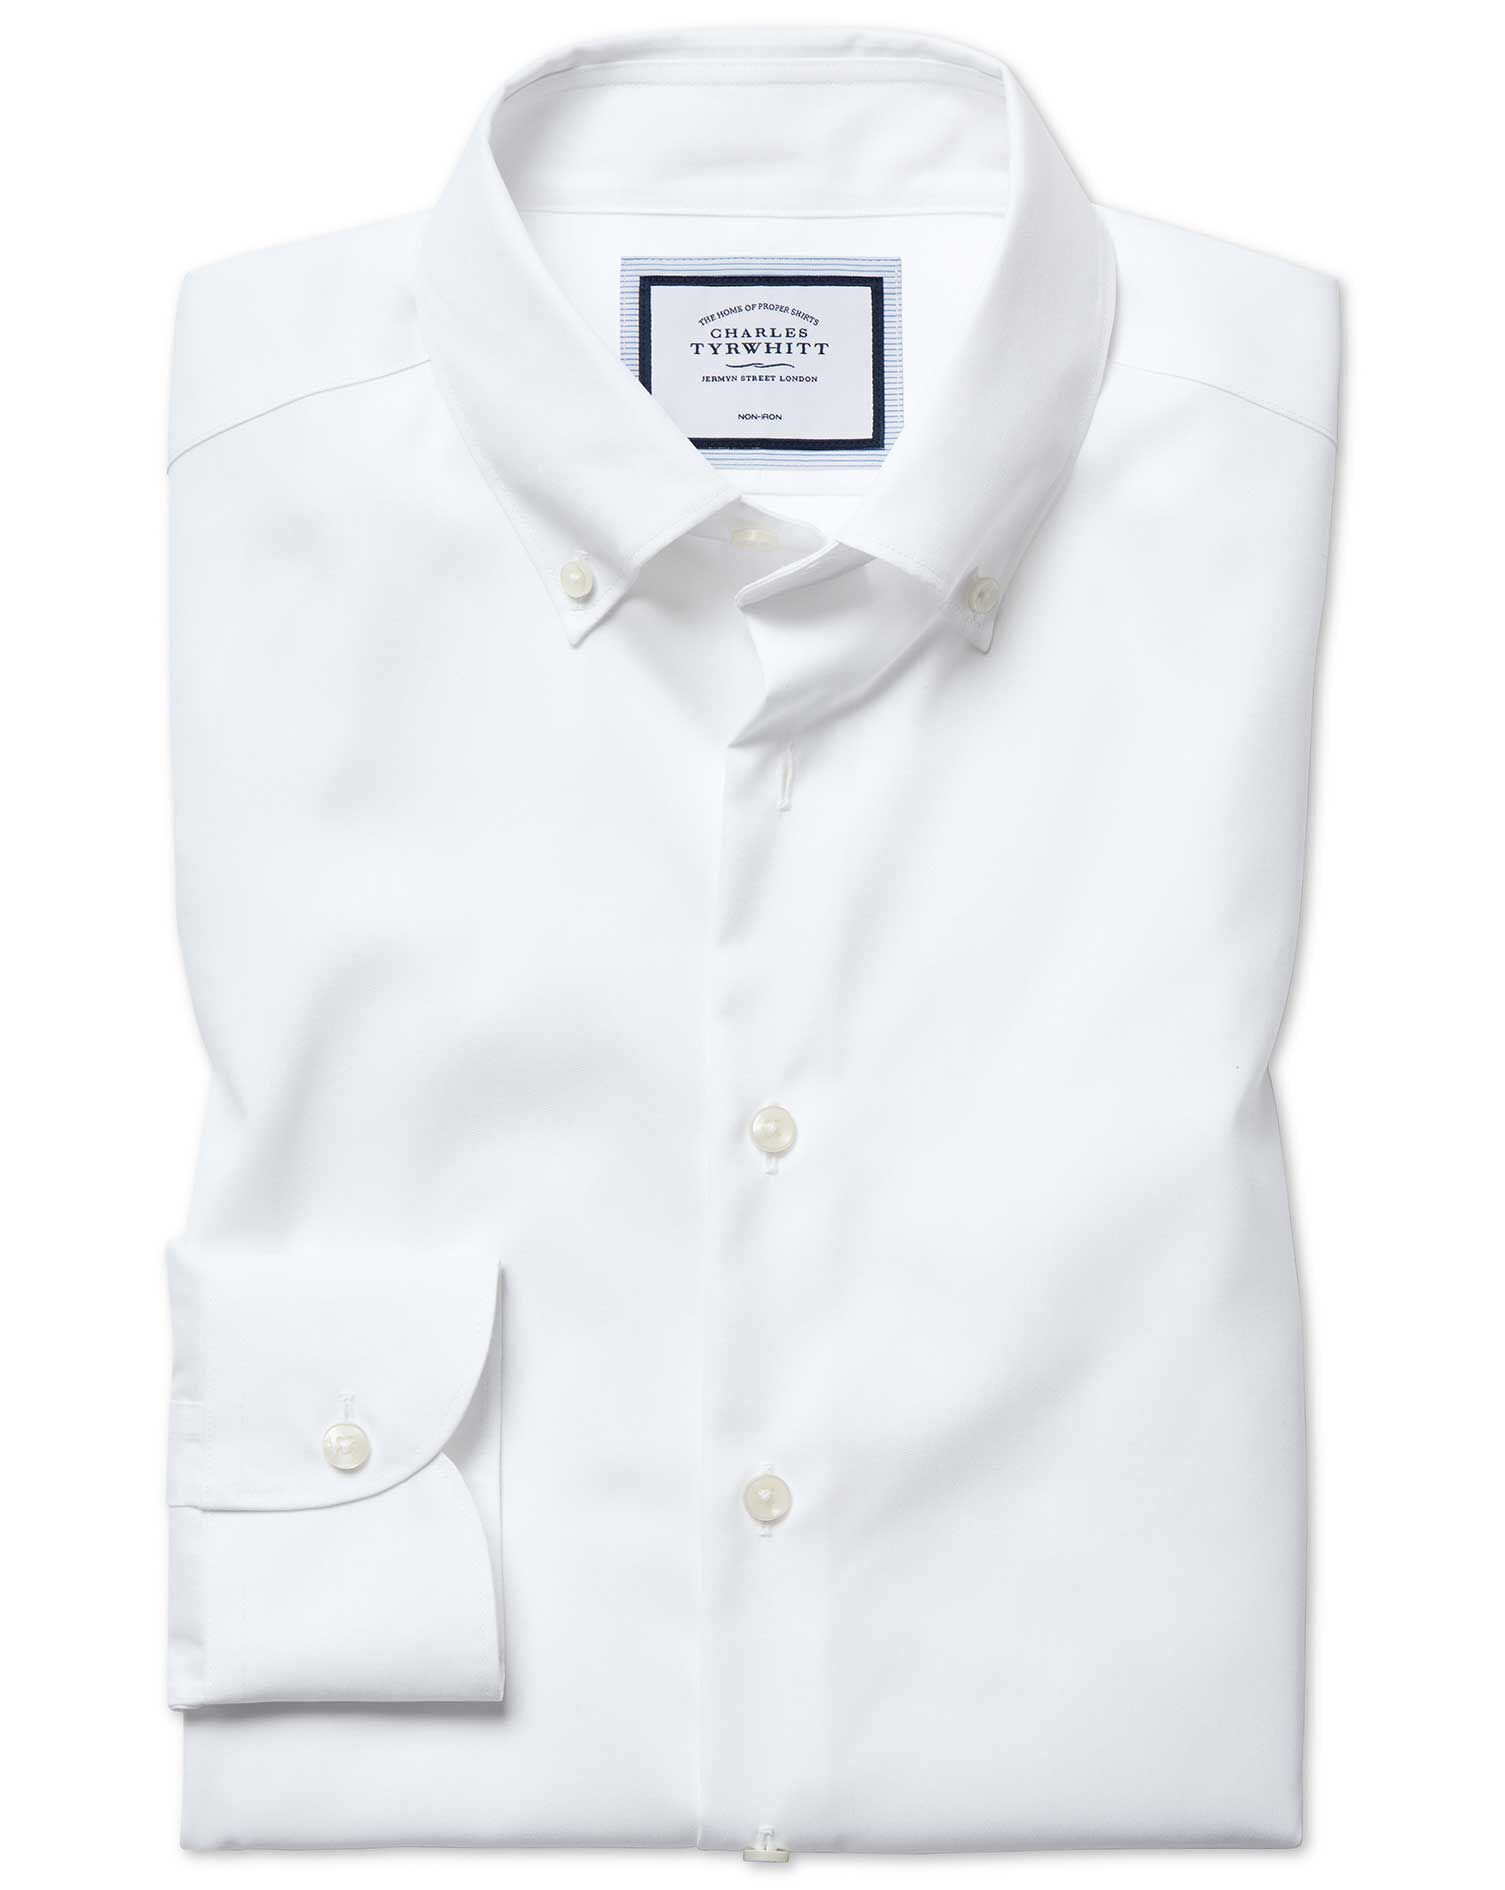 Men's Clothing White Charles Tyrwhitt Shirt Dress Shirts